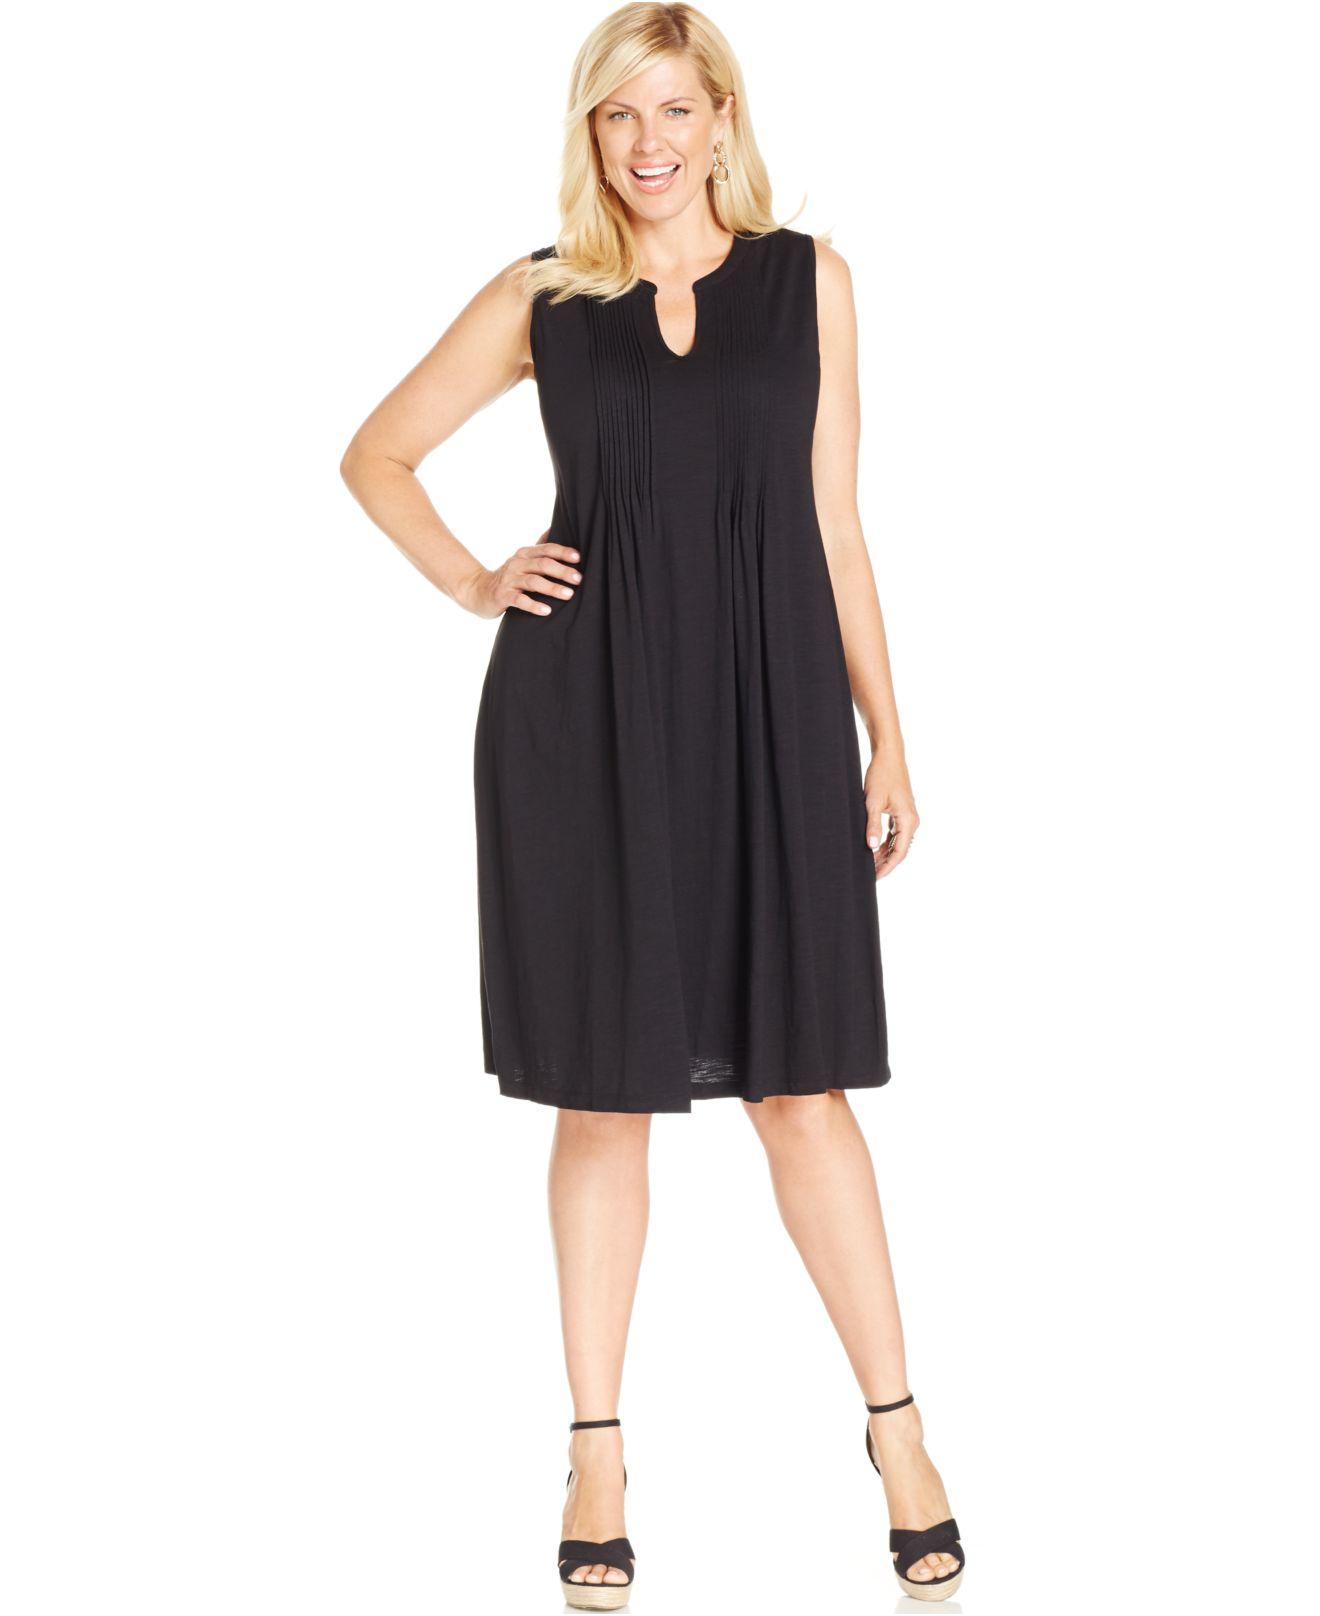 Lyst - Jones New York Signature Plus Size Pintucked Dress in ...